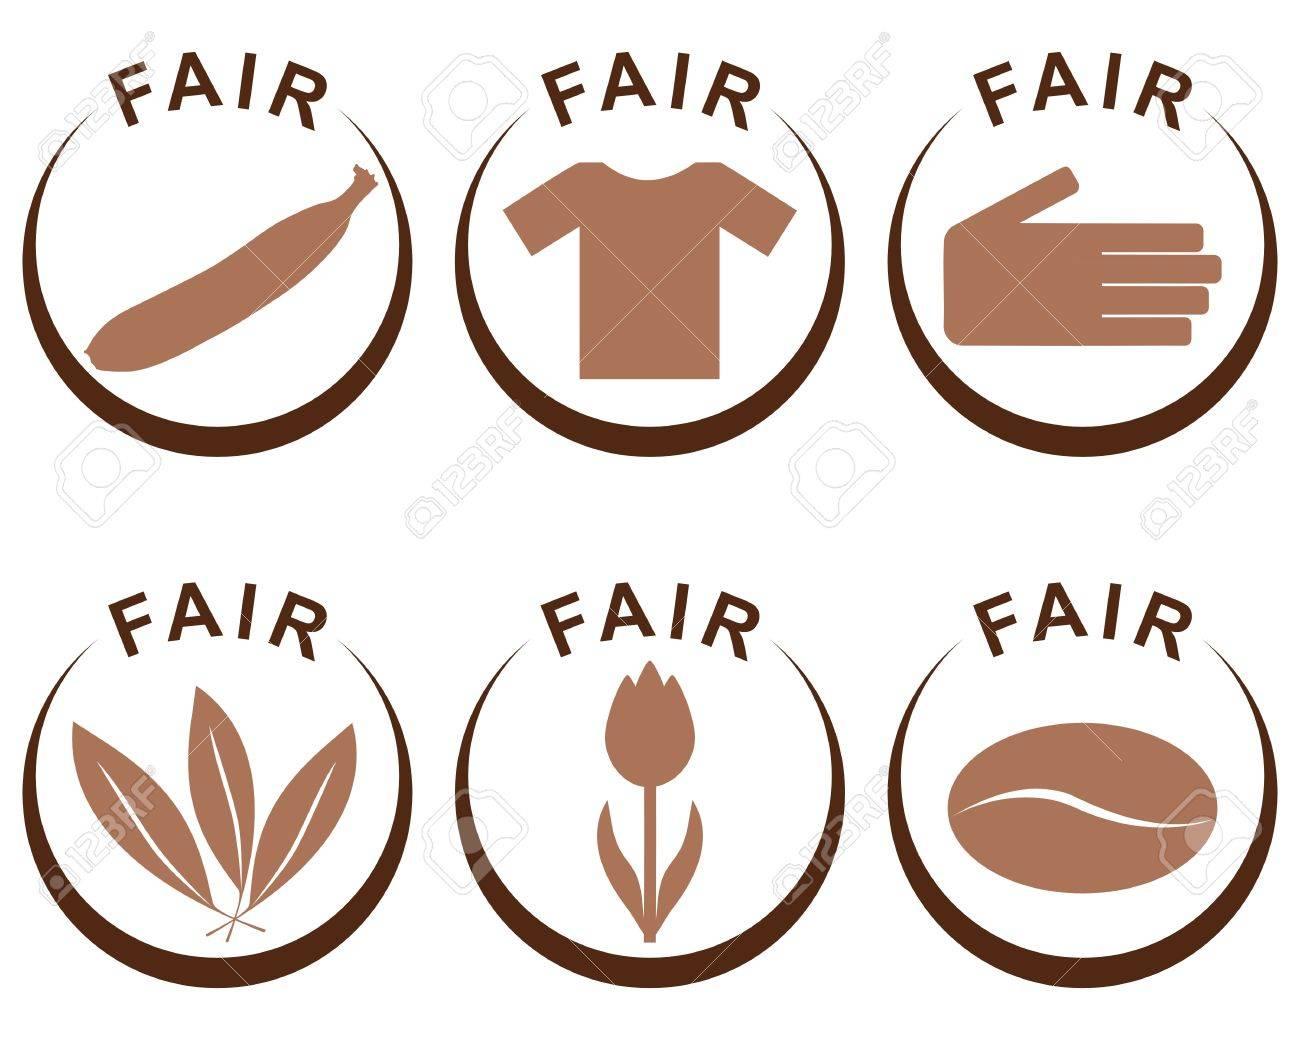 Symbols And Products Of Fair Trade Royalty Free Cliparts, Vectors ...